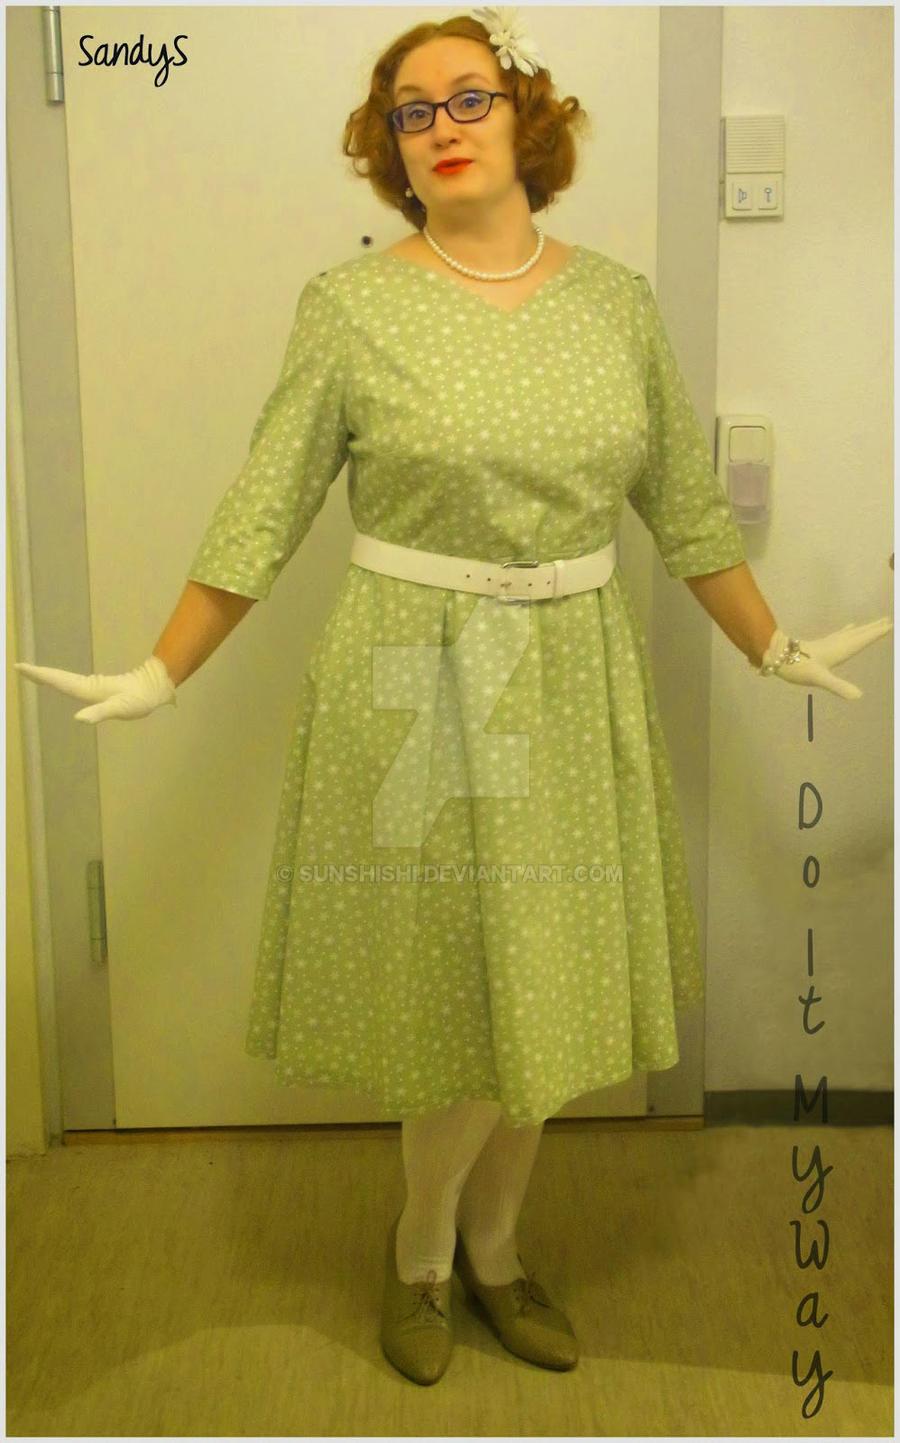 My Christmas Dress by sunshishi